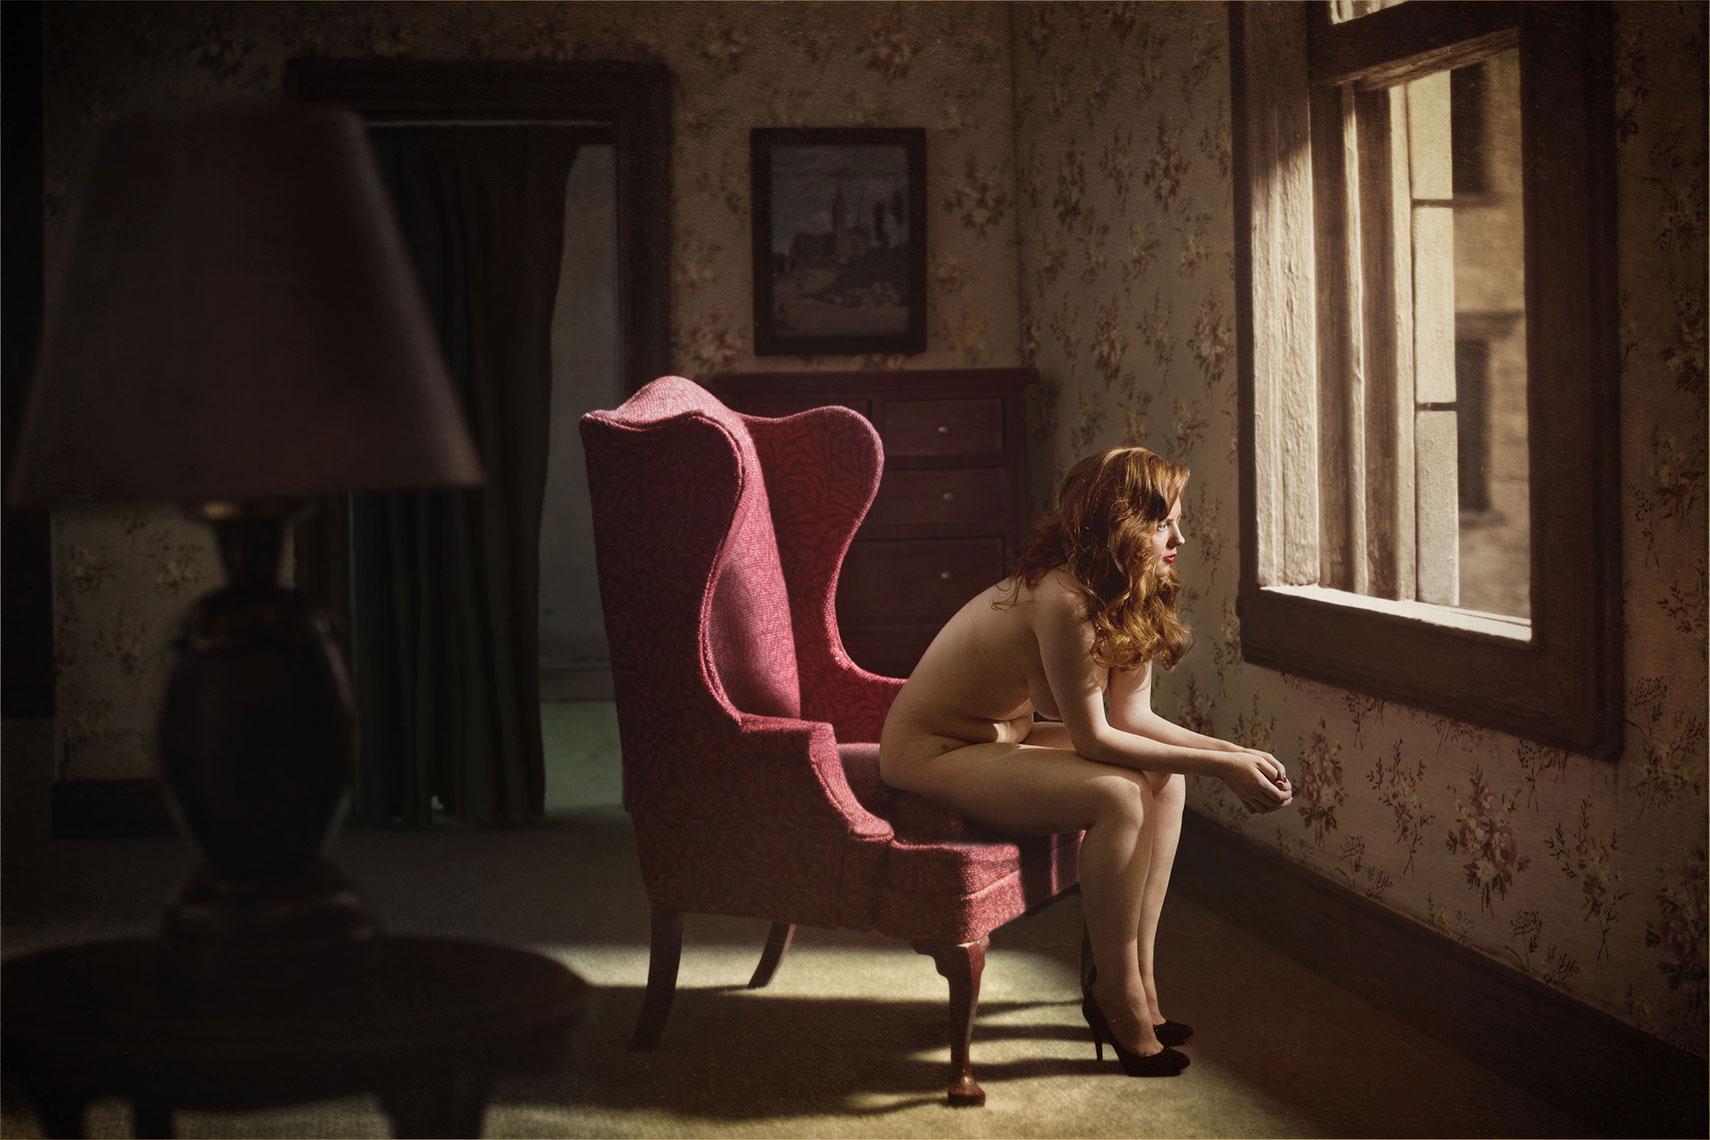 woman_at_window.jpg